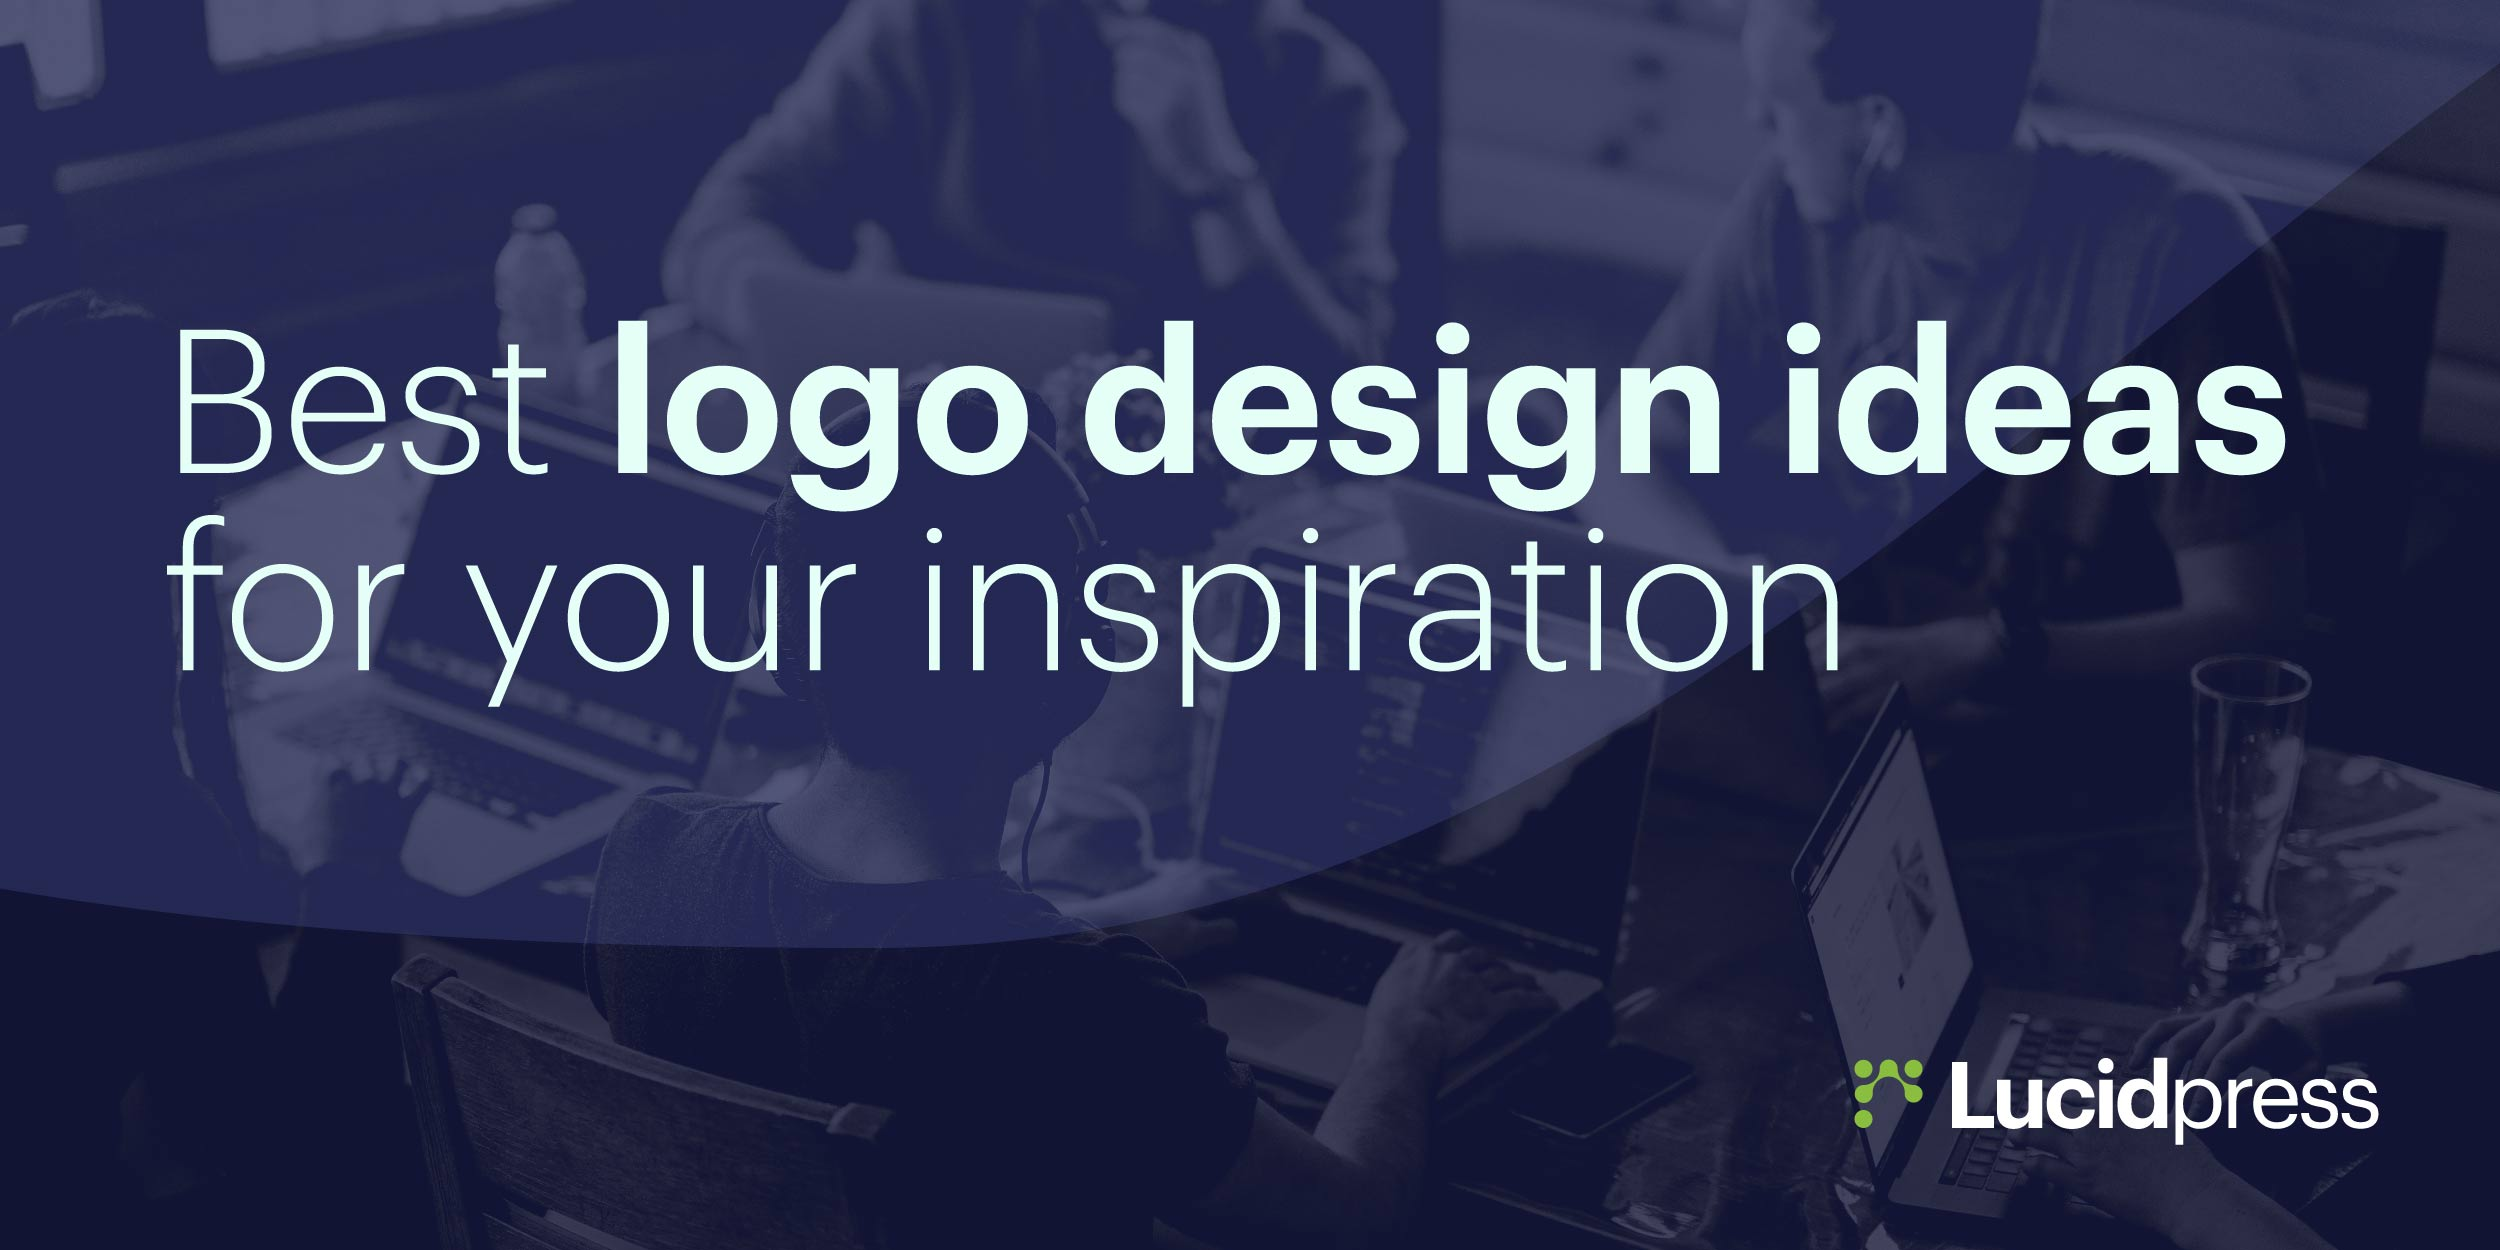 Best Logo Design Ideas for Your Inspiration | Lucidpress